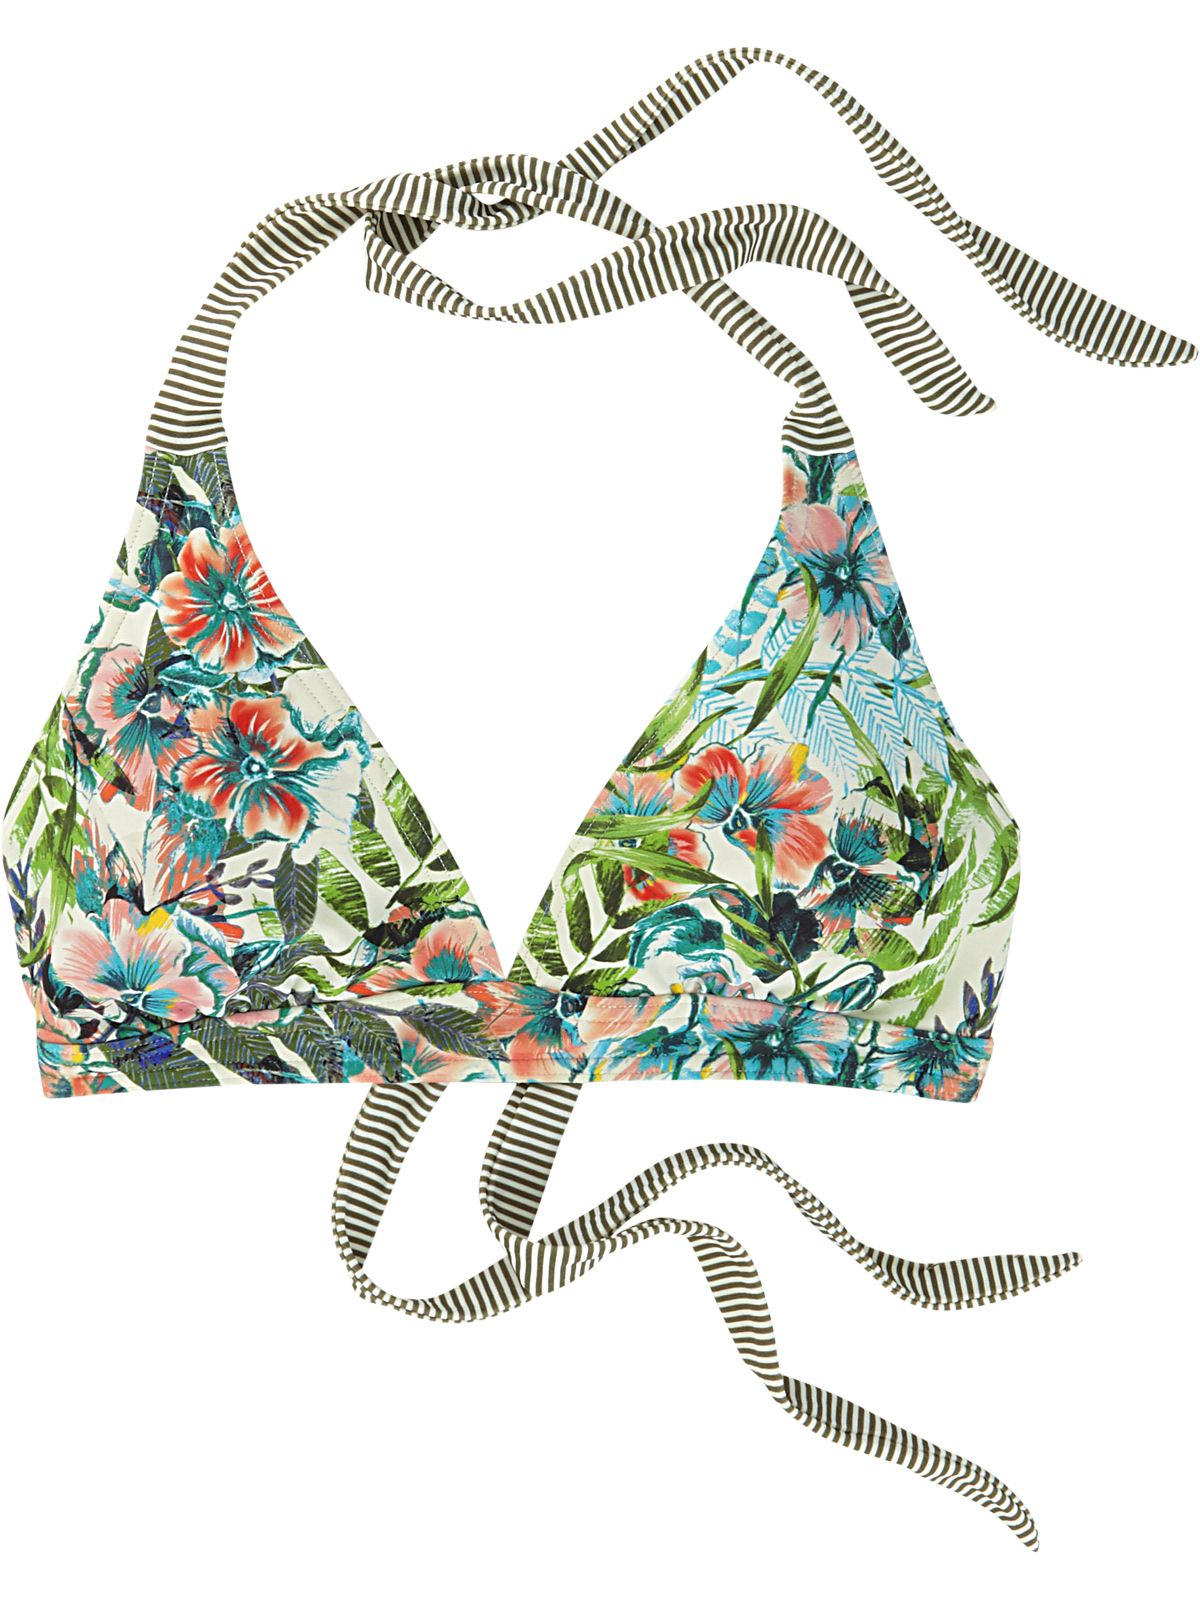 083ed64d8b9 Mahalo Bikini Top - Cargo Bali. Title Nine. T9. Active swimsuits. Swim that  stays put. Active moms. Women swim. Pattern. Floral. Bikini. Custom  coverage.